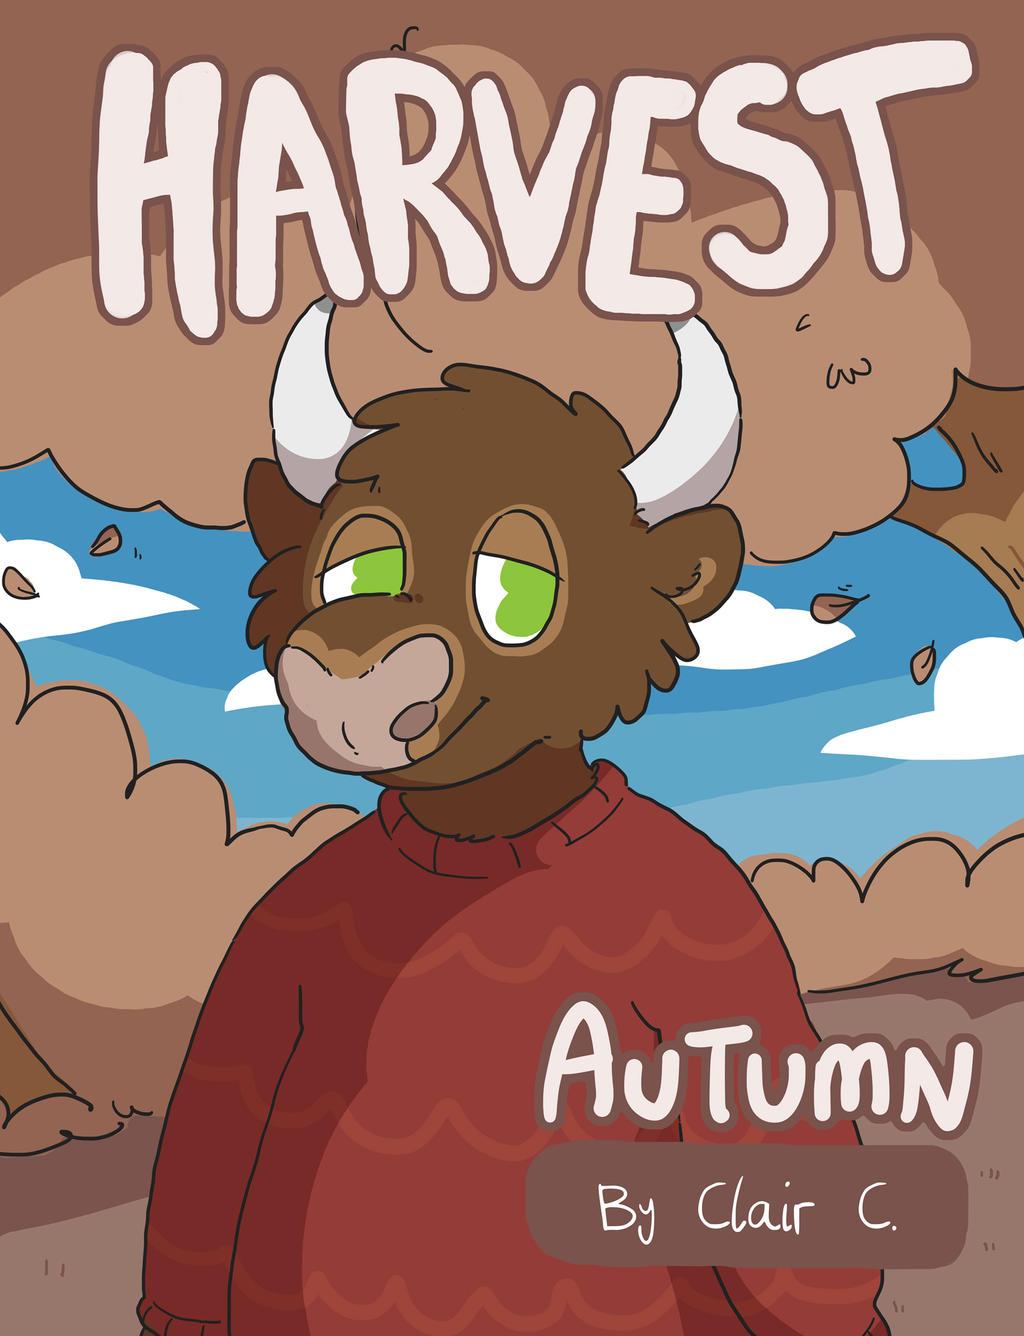 Harvest vol.3 by ccartstuff